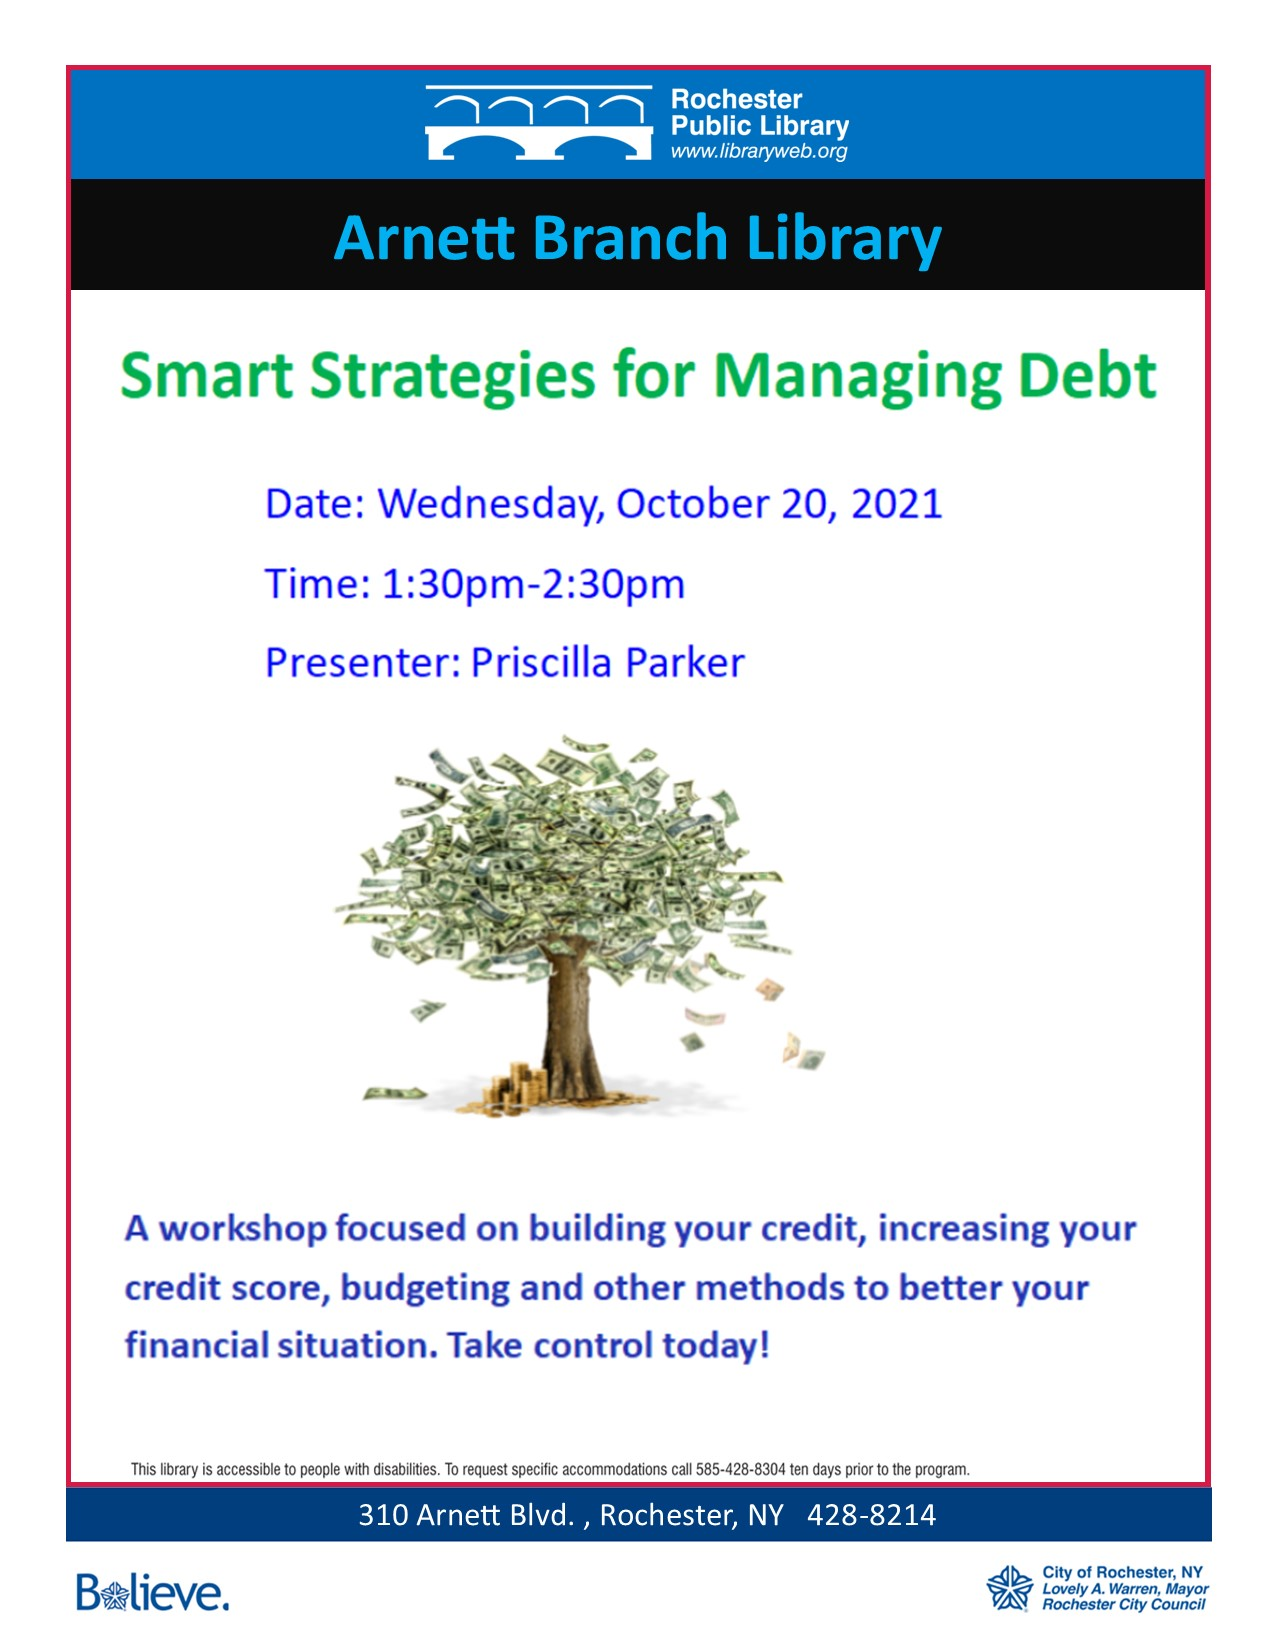 Smart Strategies for Managing Debt